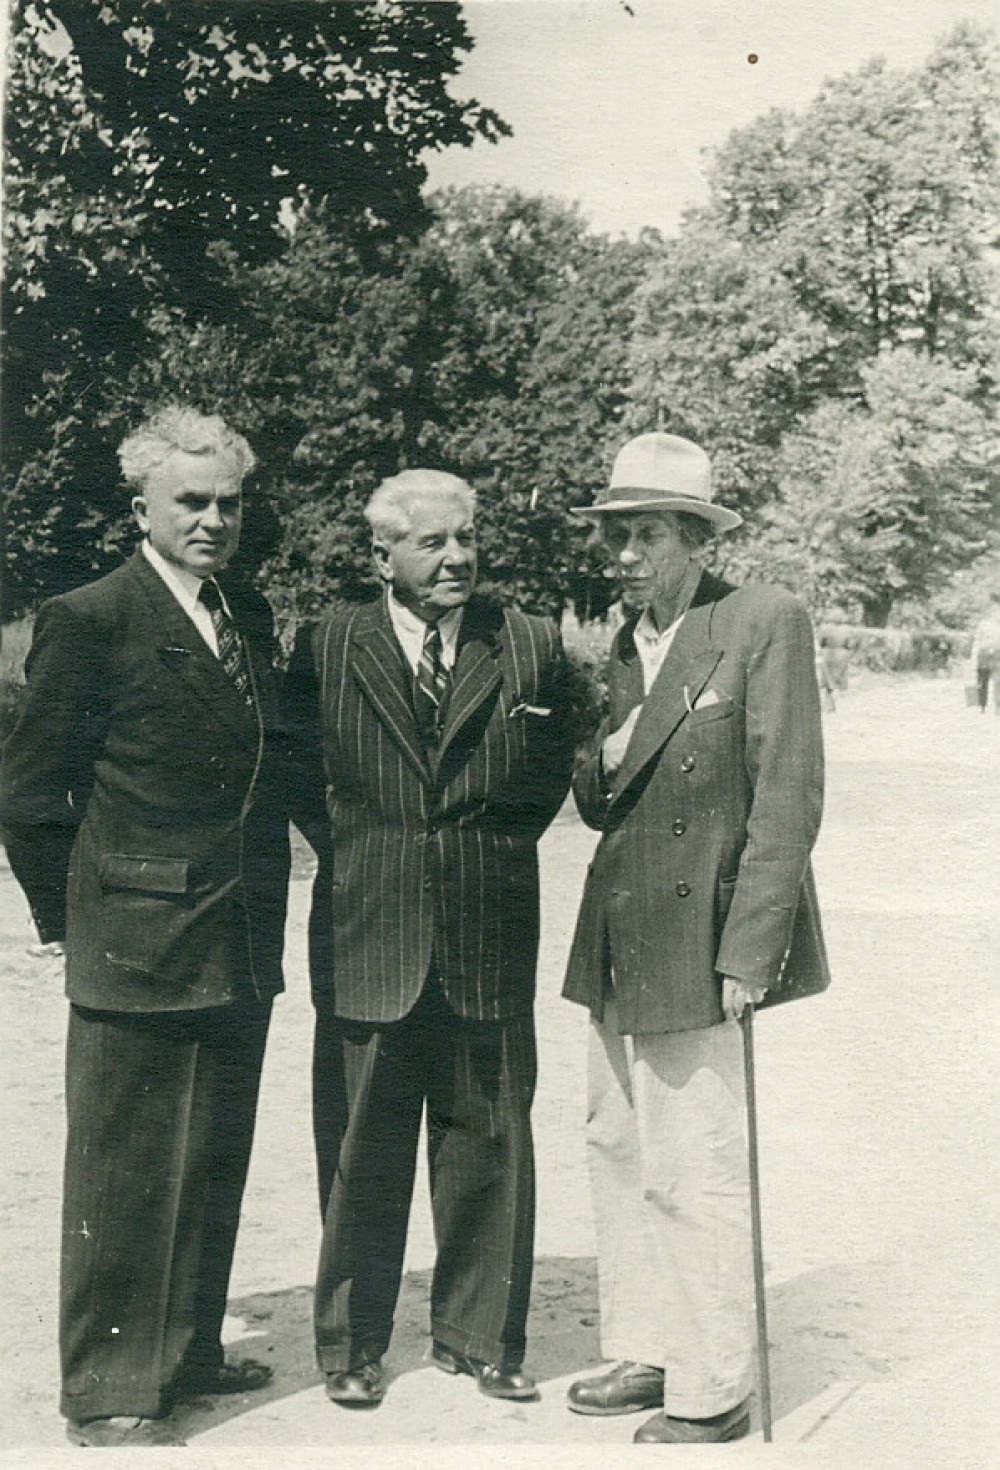 P. Vaičiūnas, kompozitorius K. Kaveckas ir dainininkas J. Bieliūnas. Vilnius, 1957 m.